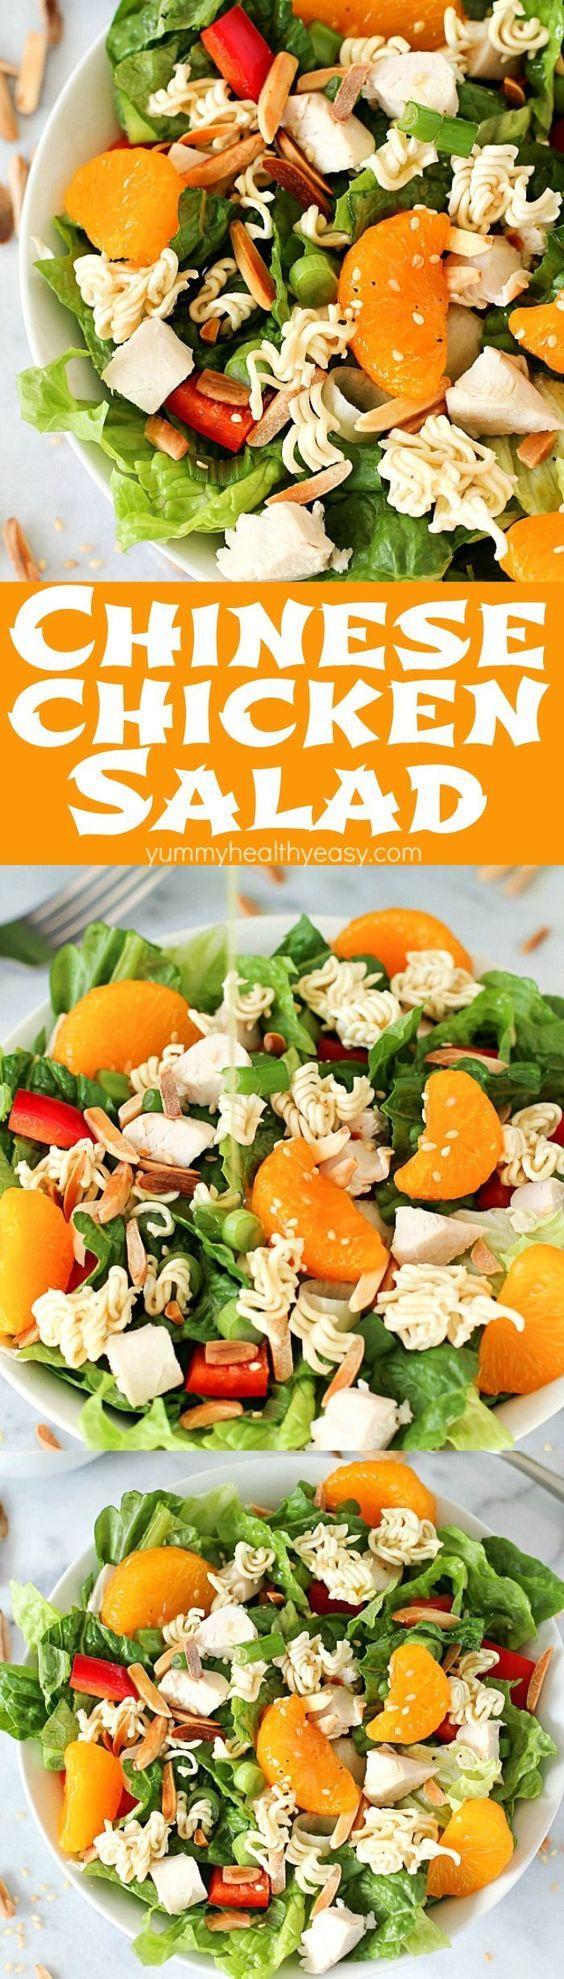 Fuck anus asian lettuce salad recipe want